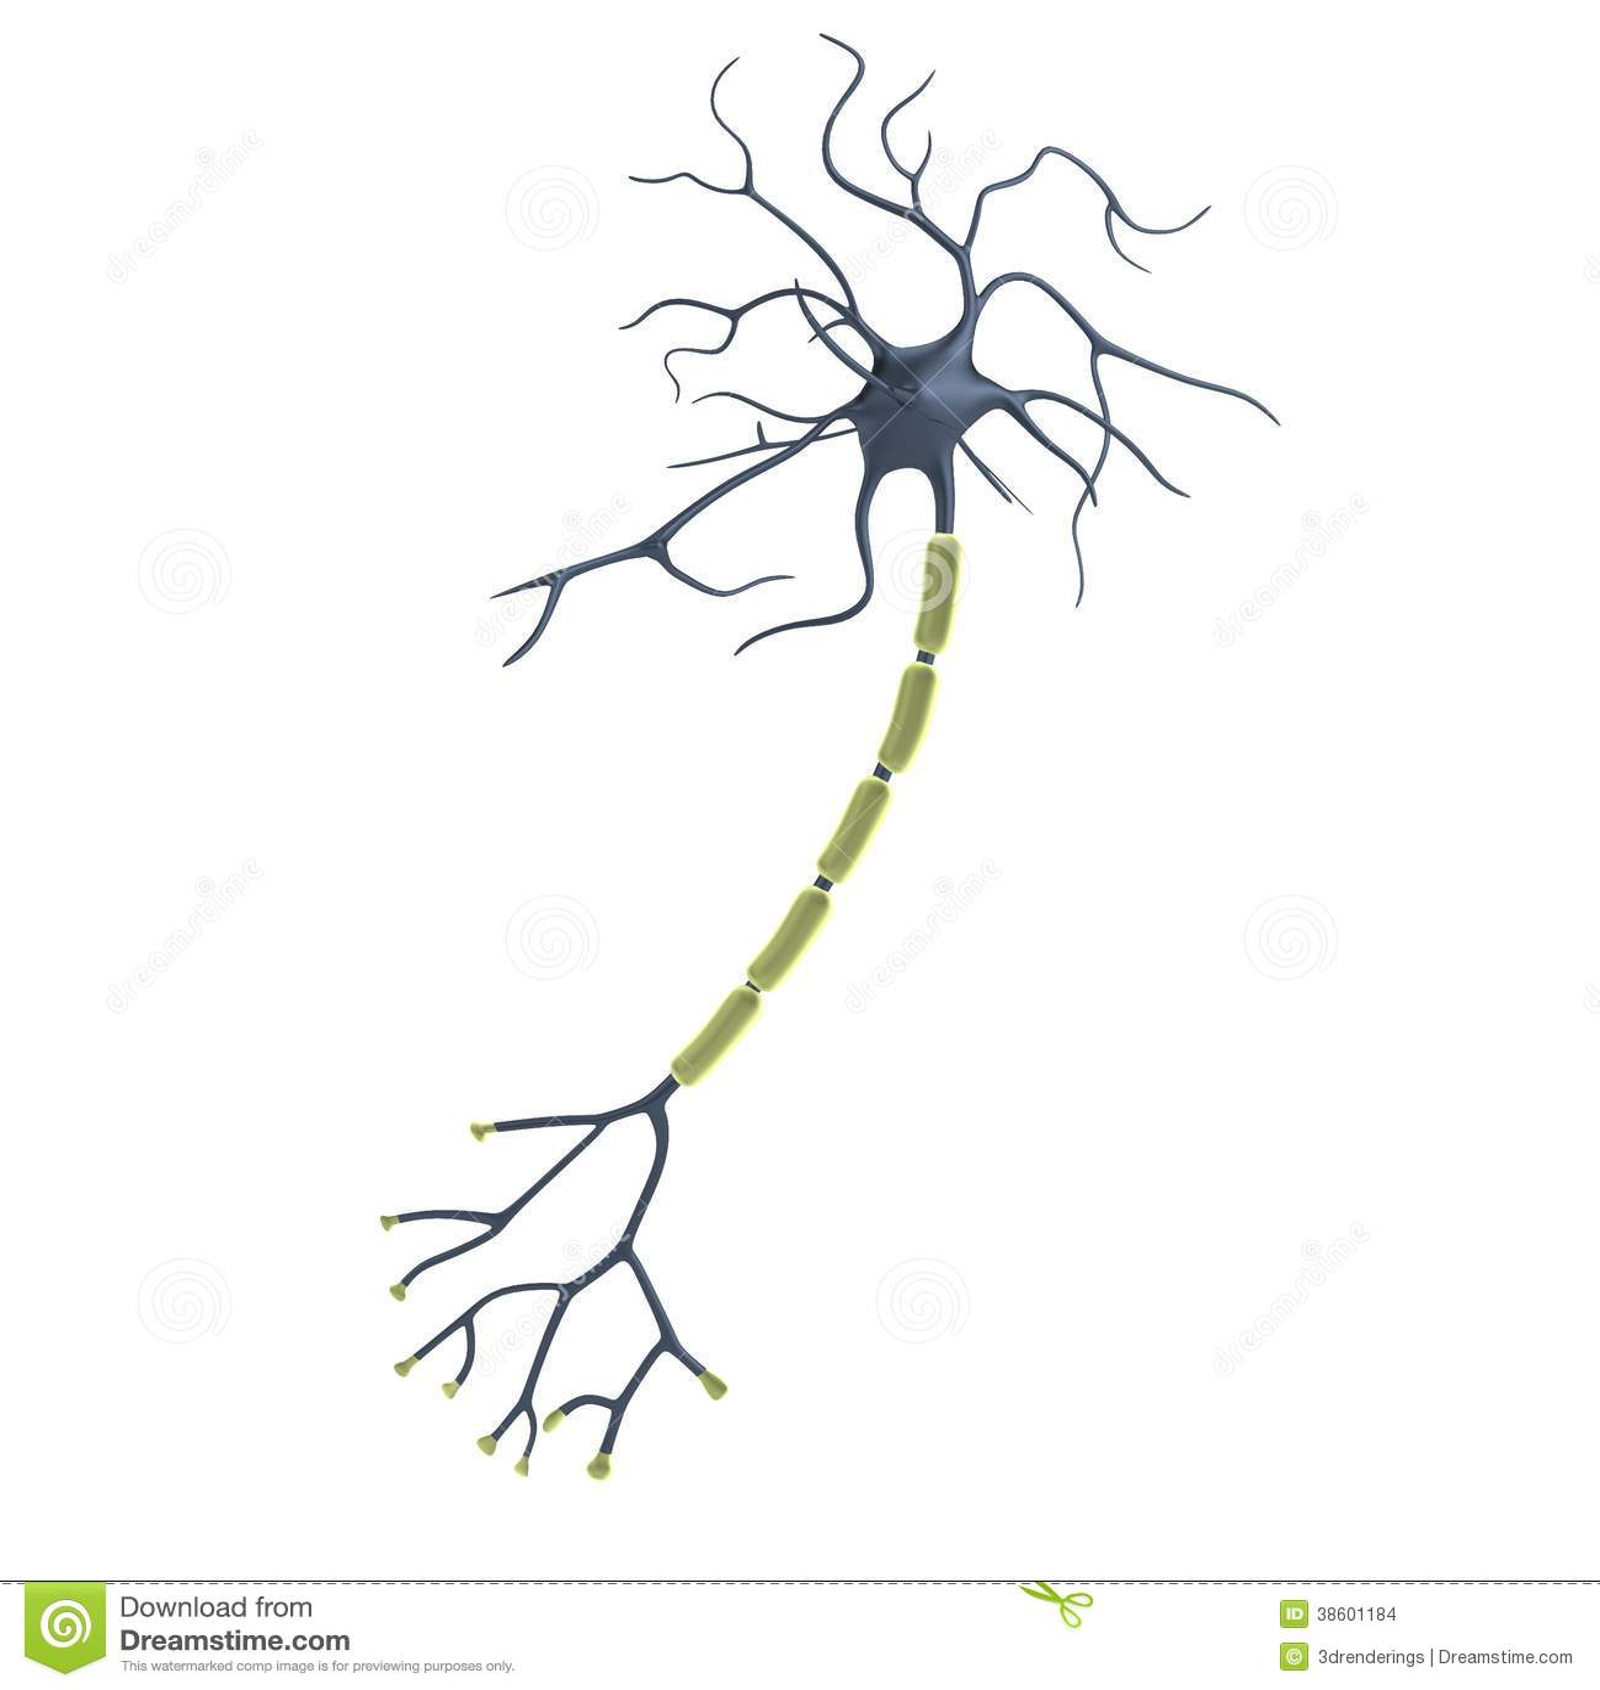 3d Render Of Neuron Stock Illustration Illustration Of